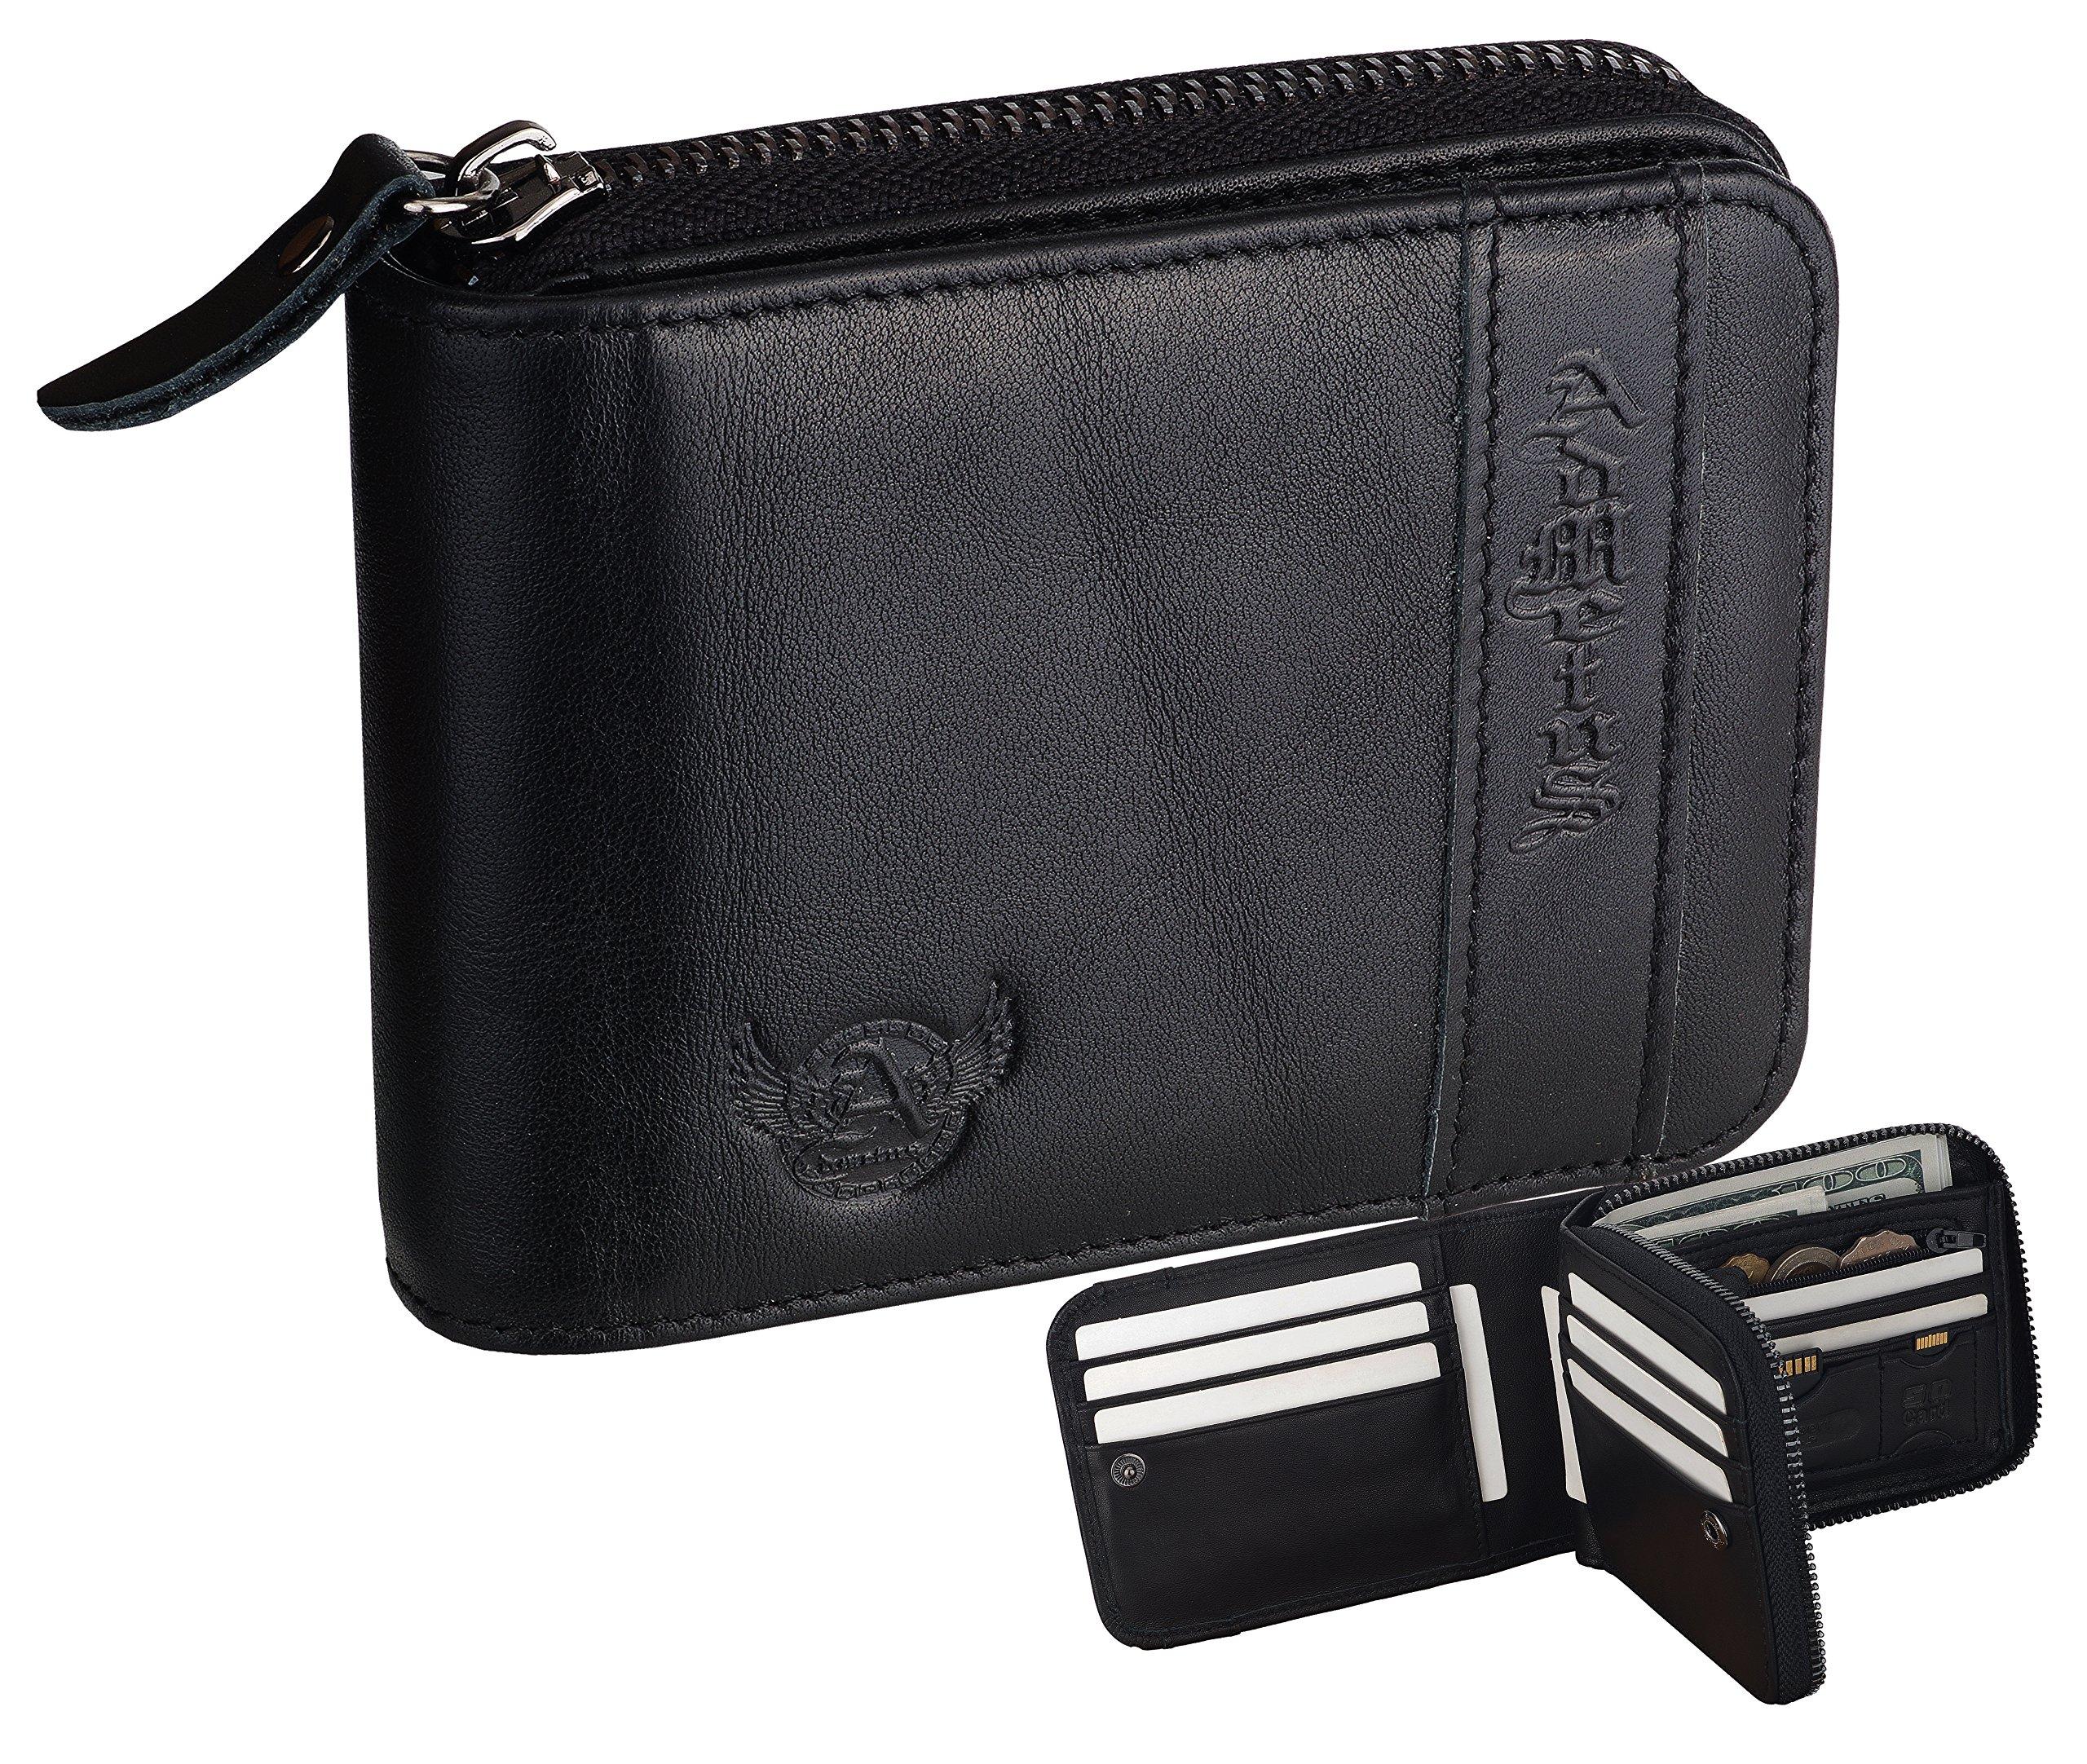 RFID Wallet Admetus Men's Genuine Leather Bifold Zip-around Wallet with Elegant Gift Box